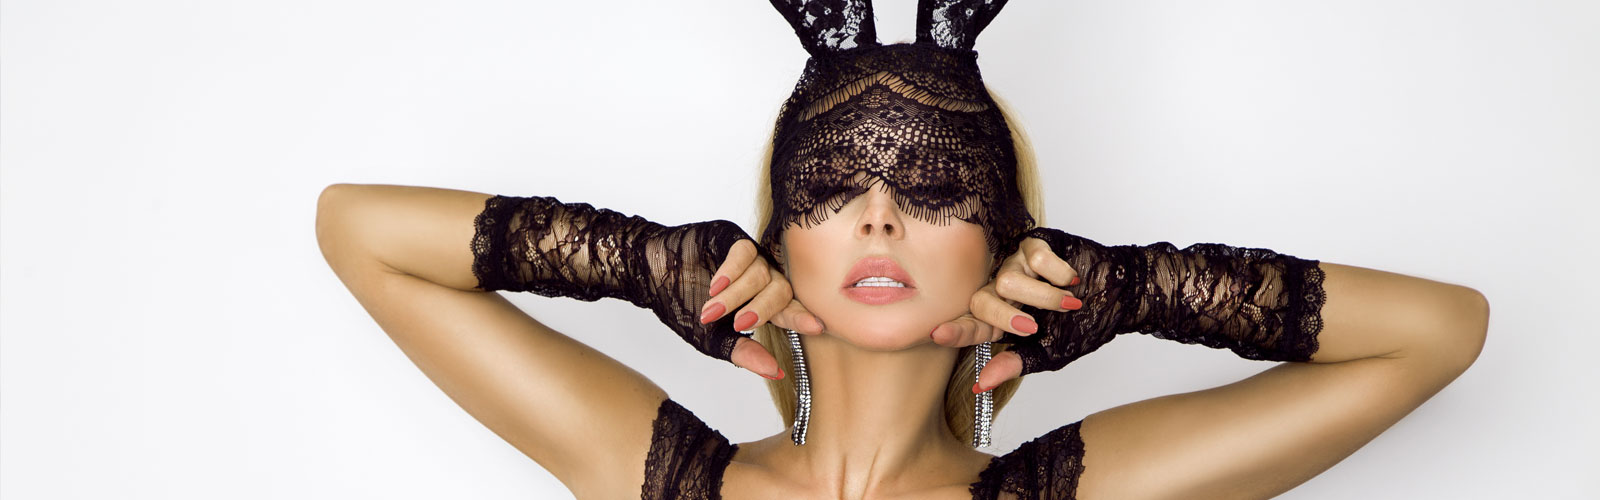 Woman in sexy bunny ear costume